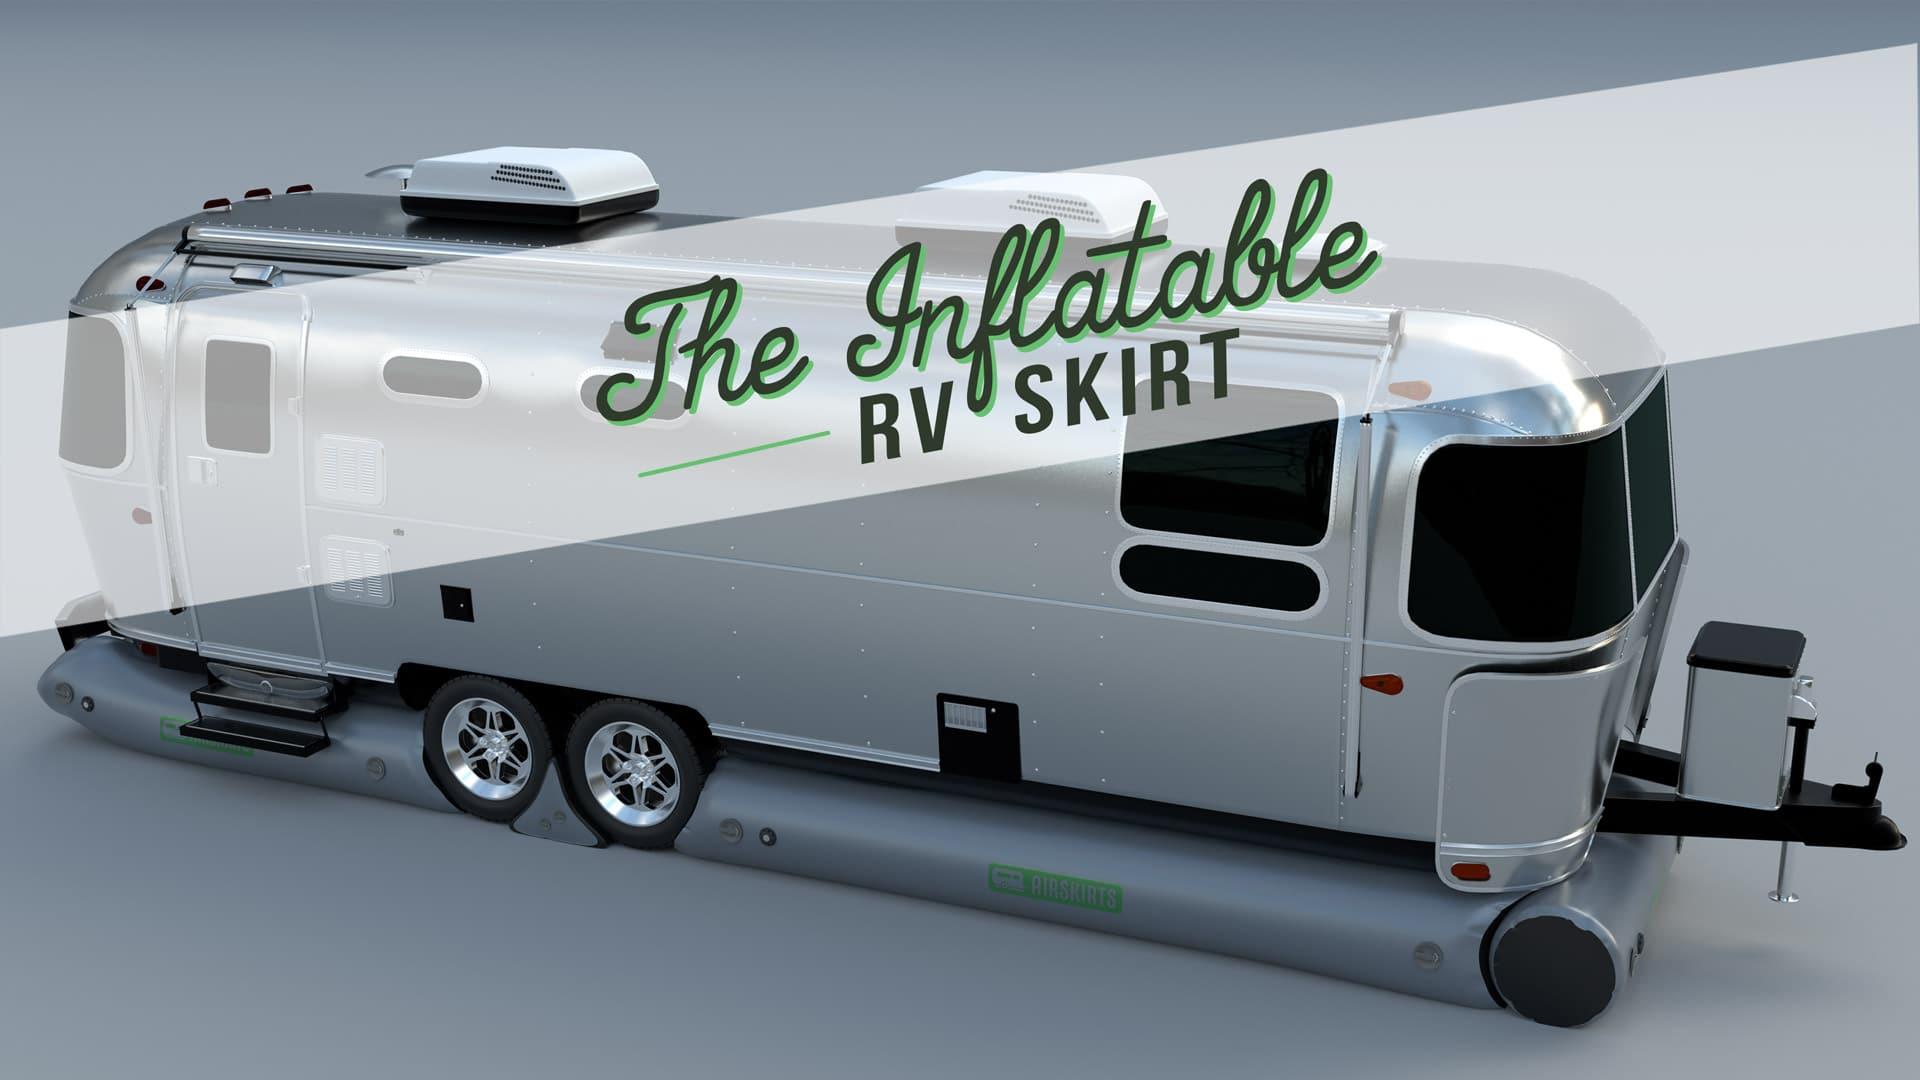 RV Skirting Airstream Fifth Wheel Camper